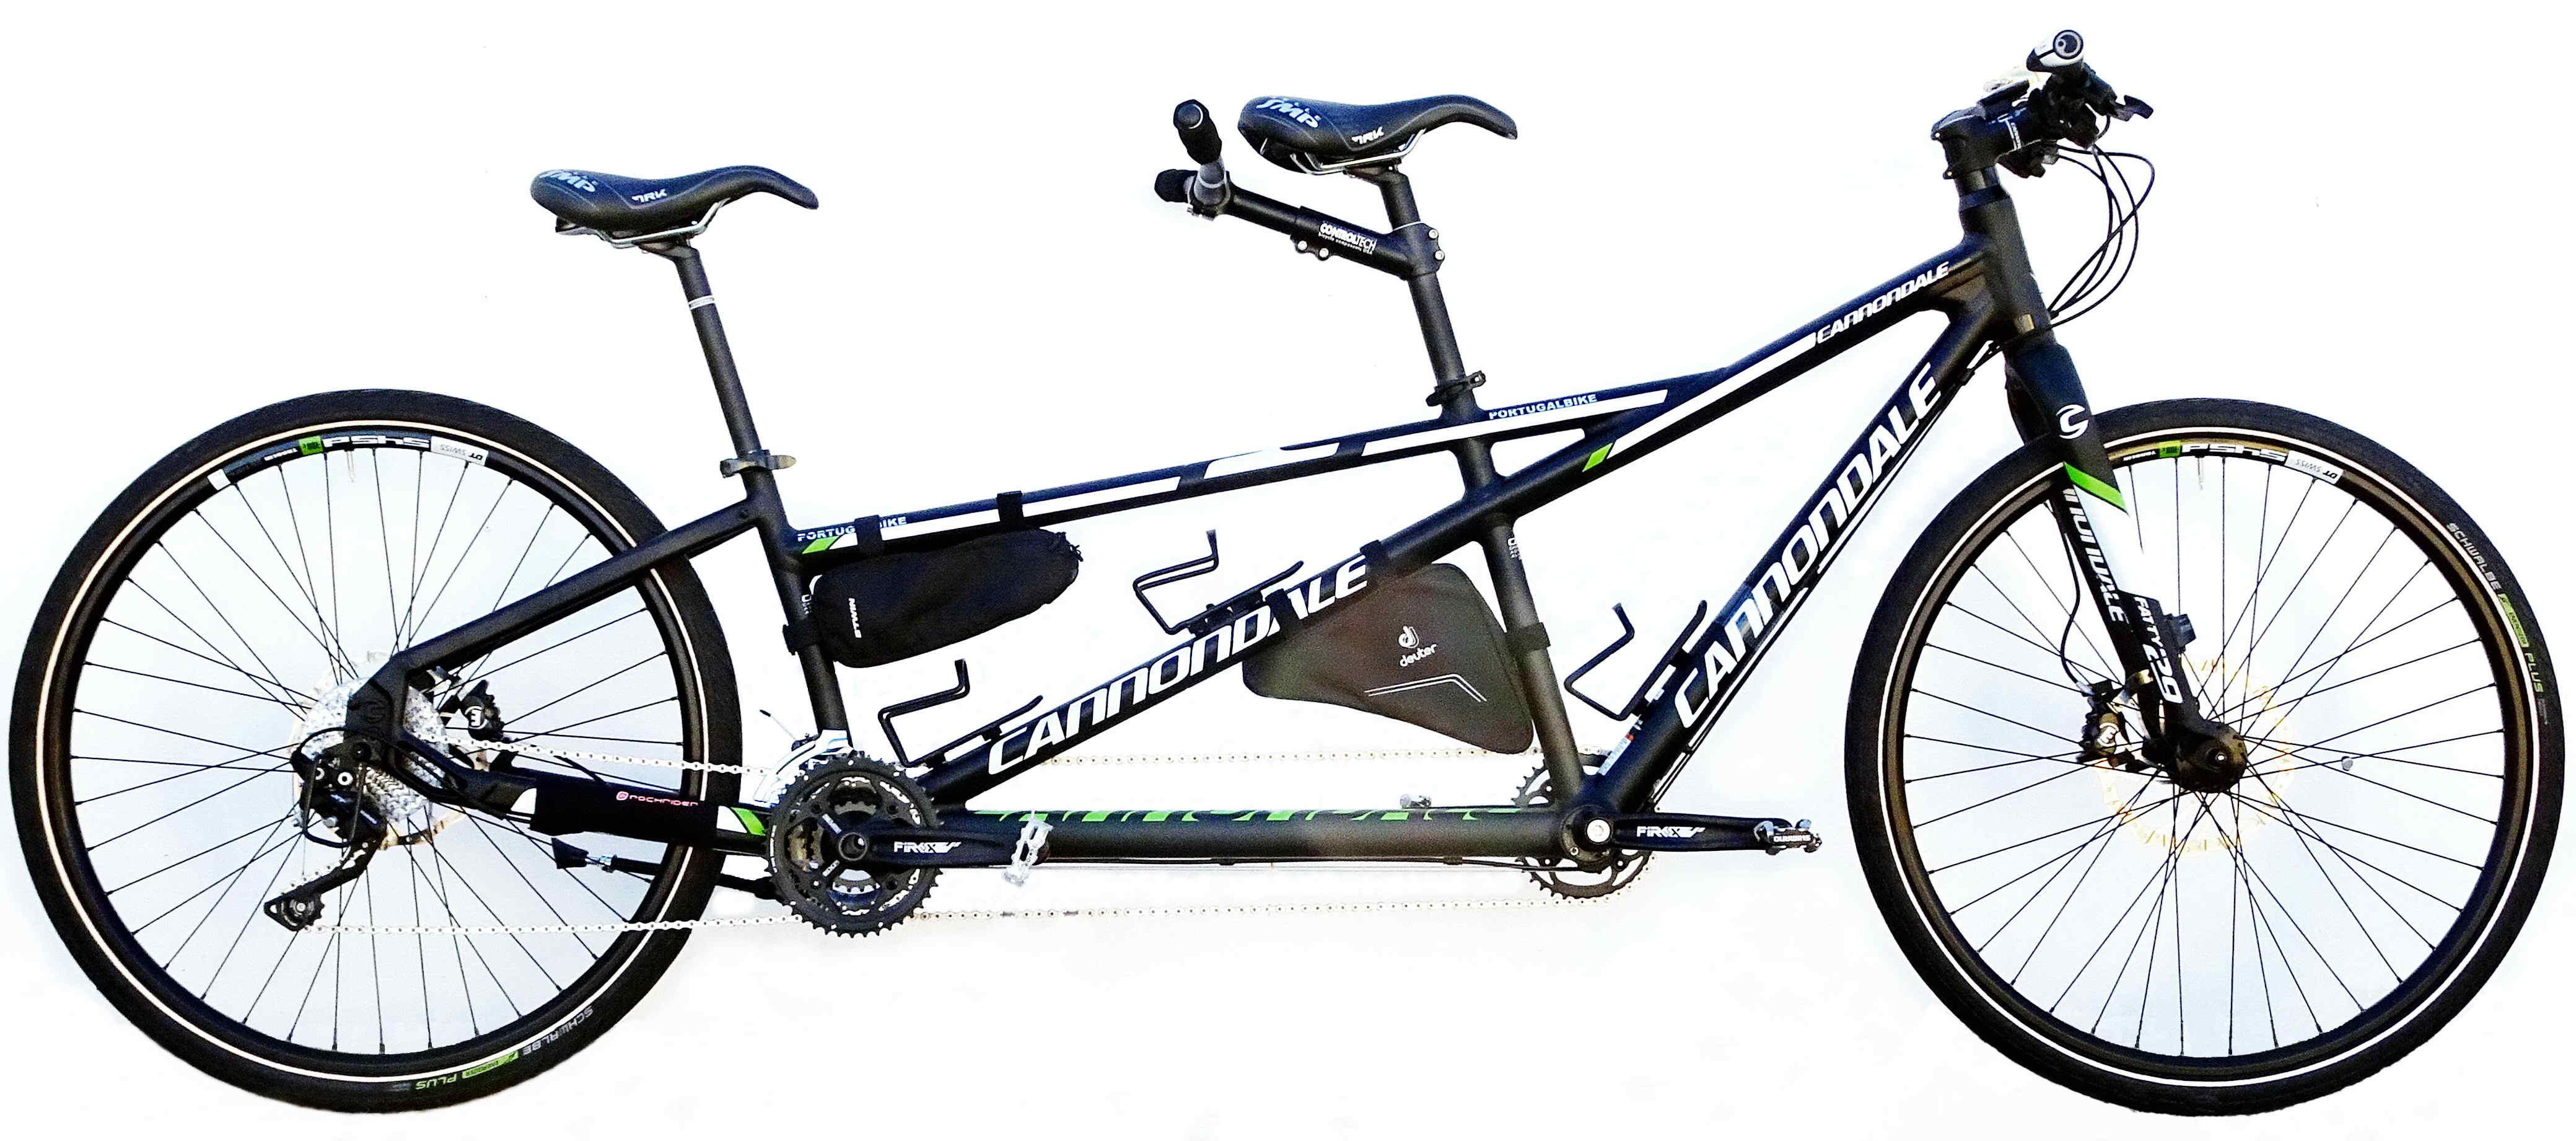 cannondale tandem bike